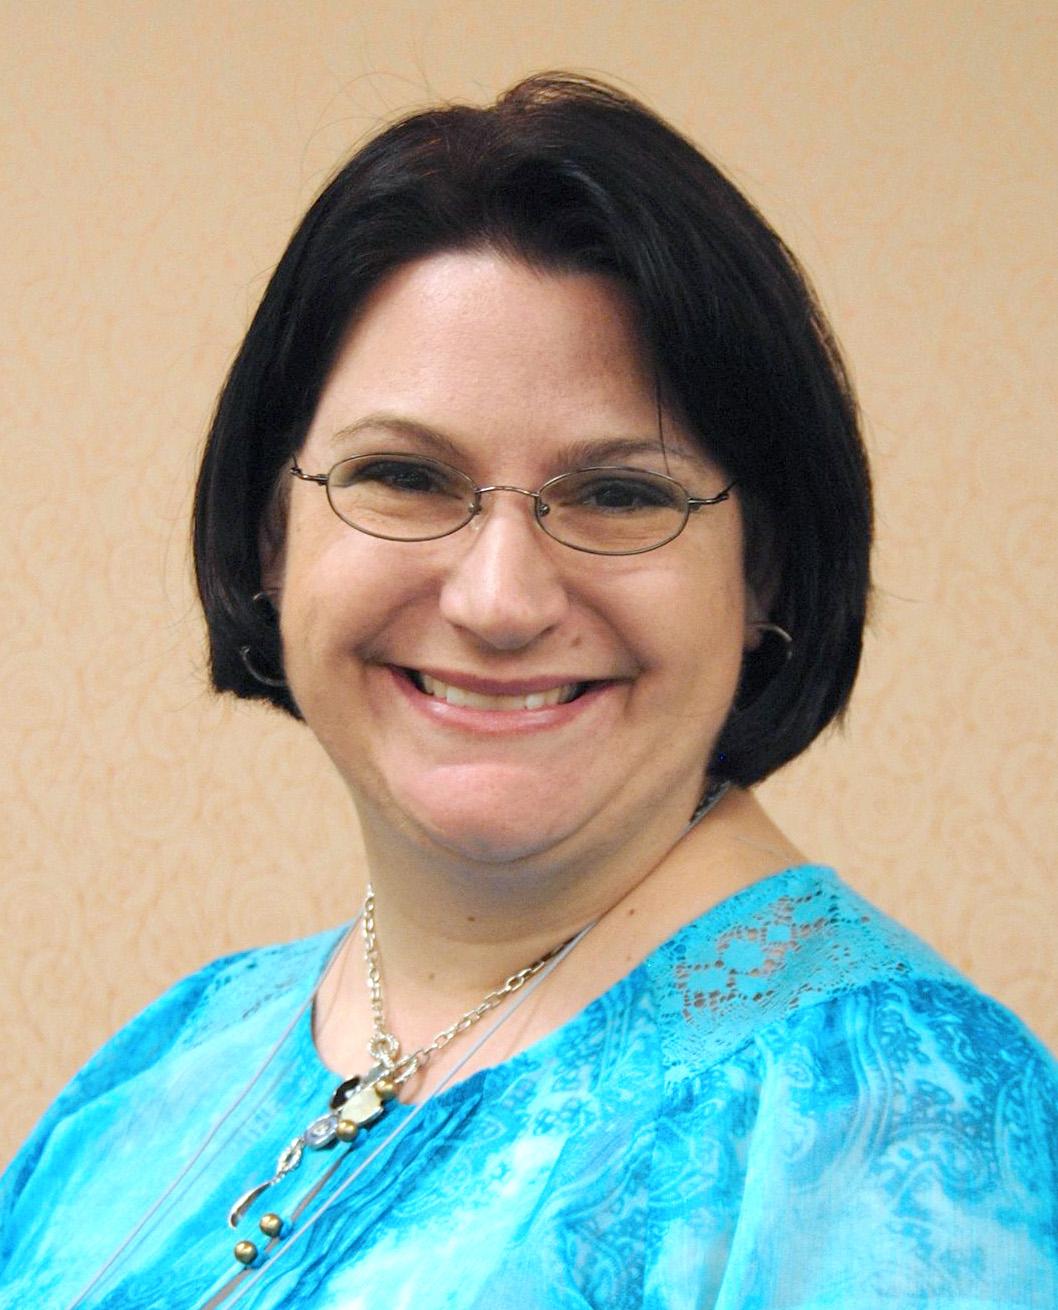 Jessica Healy, MPH